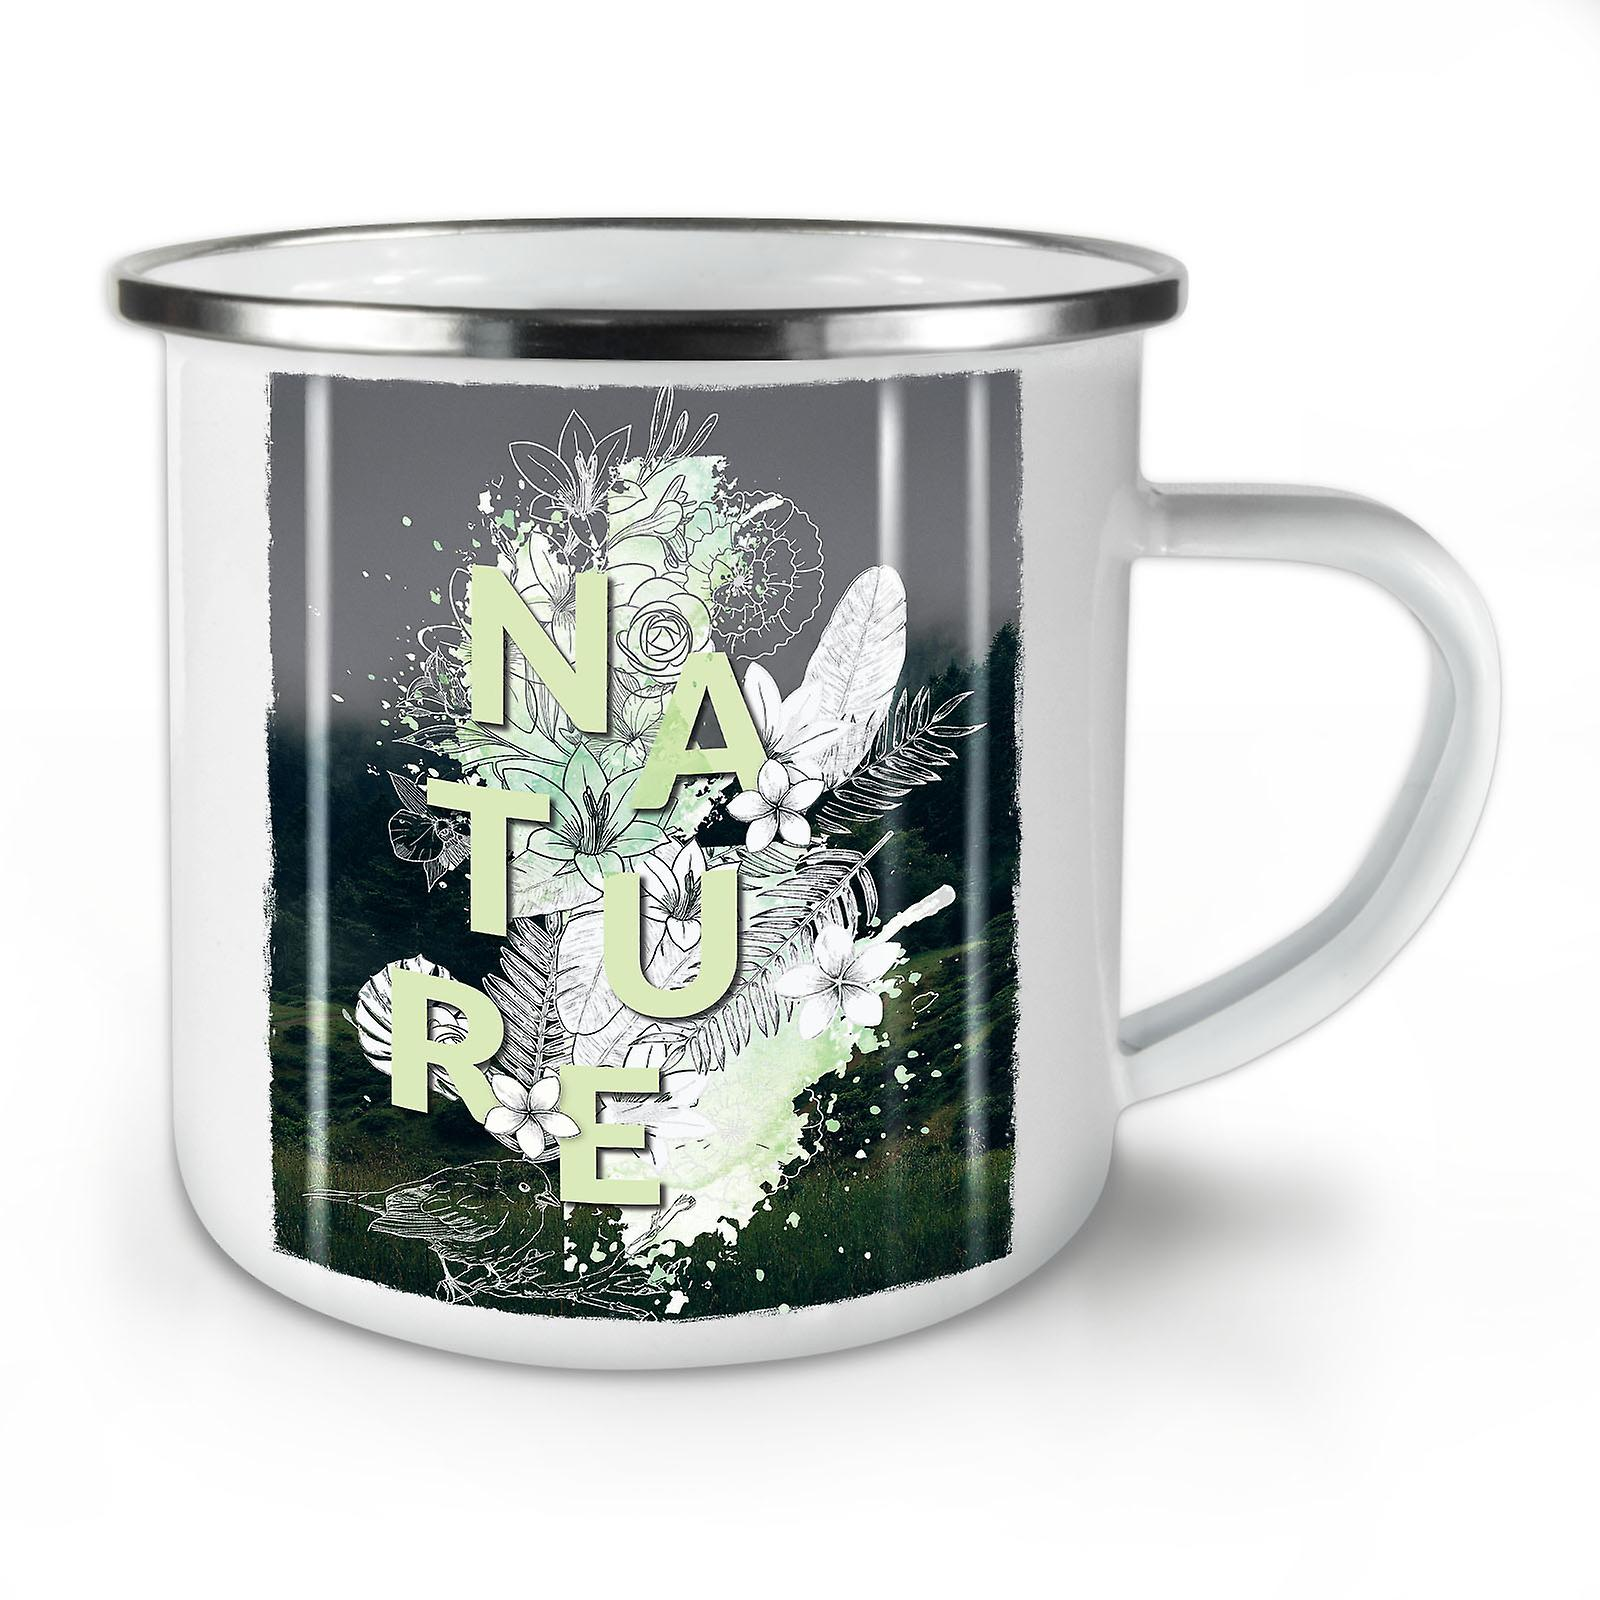 Mug10 Café Whitetea Style Émail OzWellcoda Nature Nouveau 6IfbgvmY7y